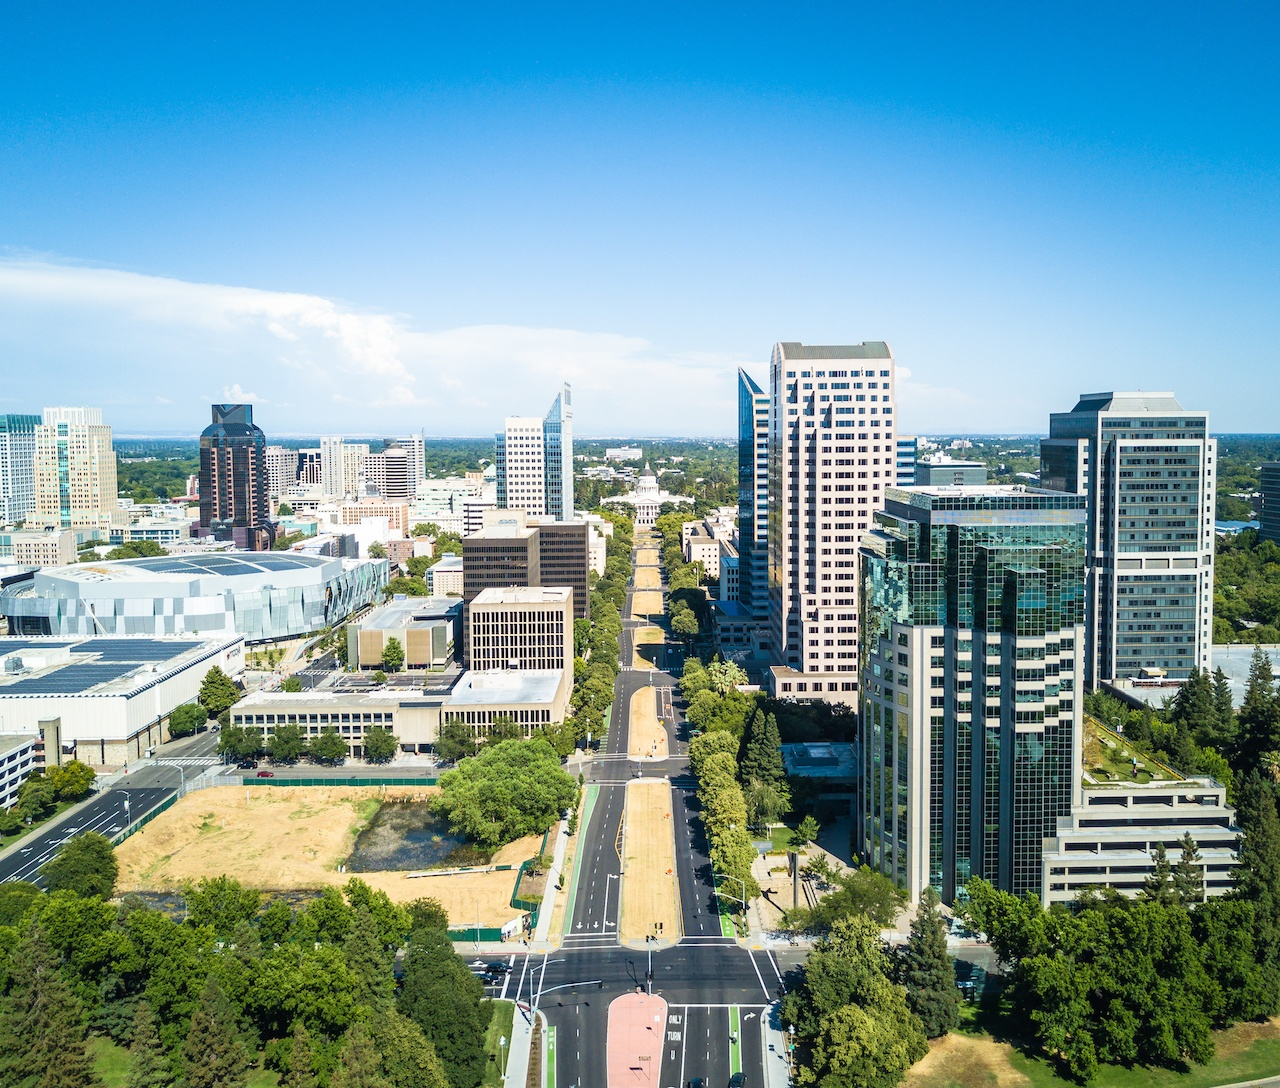 meetingoftheminds.org - Sandra Richter - The Humanability of Smart Cities